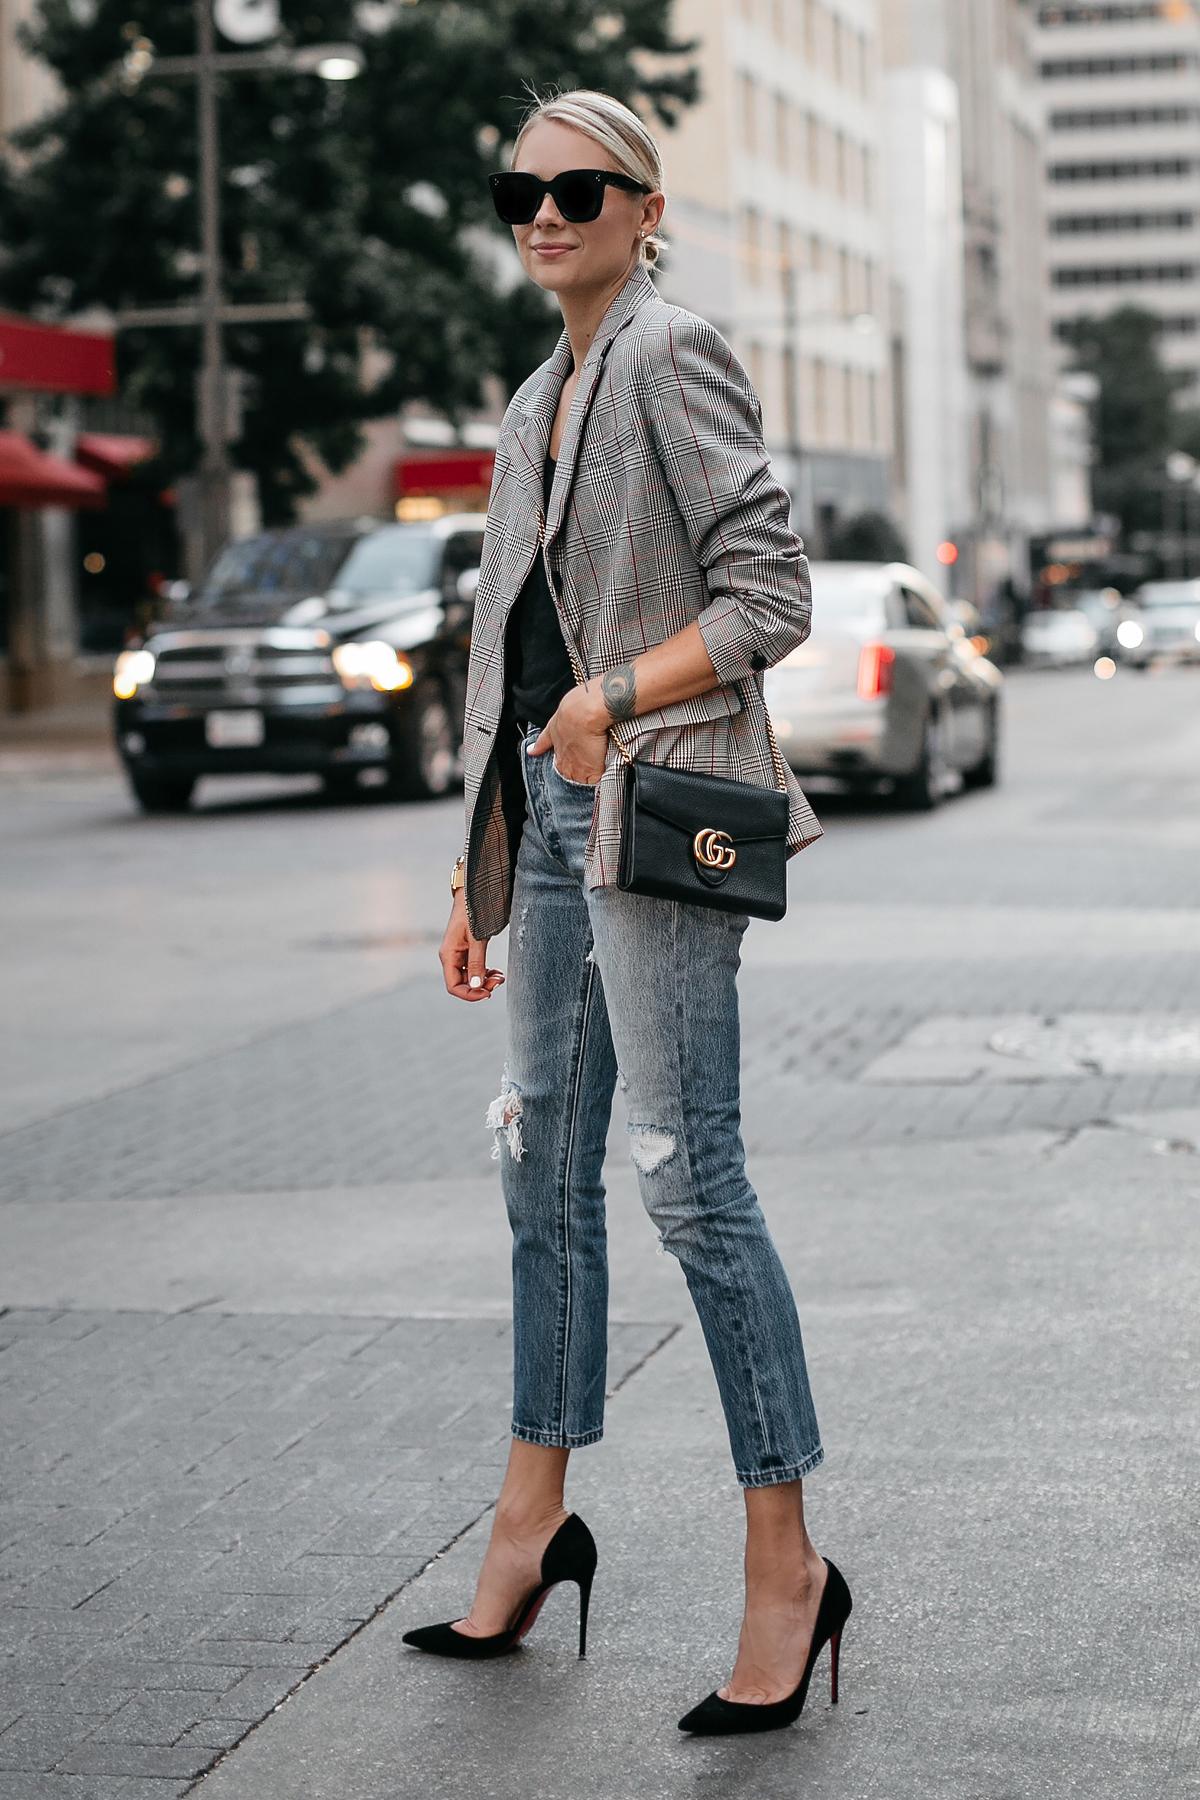 Blonde Woman Wearing Zara Plaid Blazer Denim Ripped Jeans Gucci Marmont Handbag Christian Louboutin Black Pumps Fashion Jackson Dallas Blogger Fashion Blogger Street Style